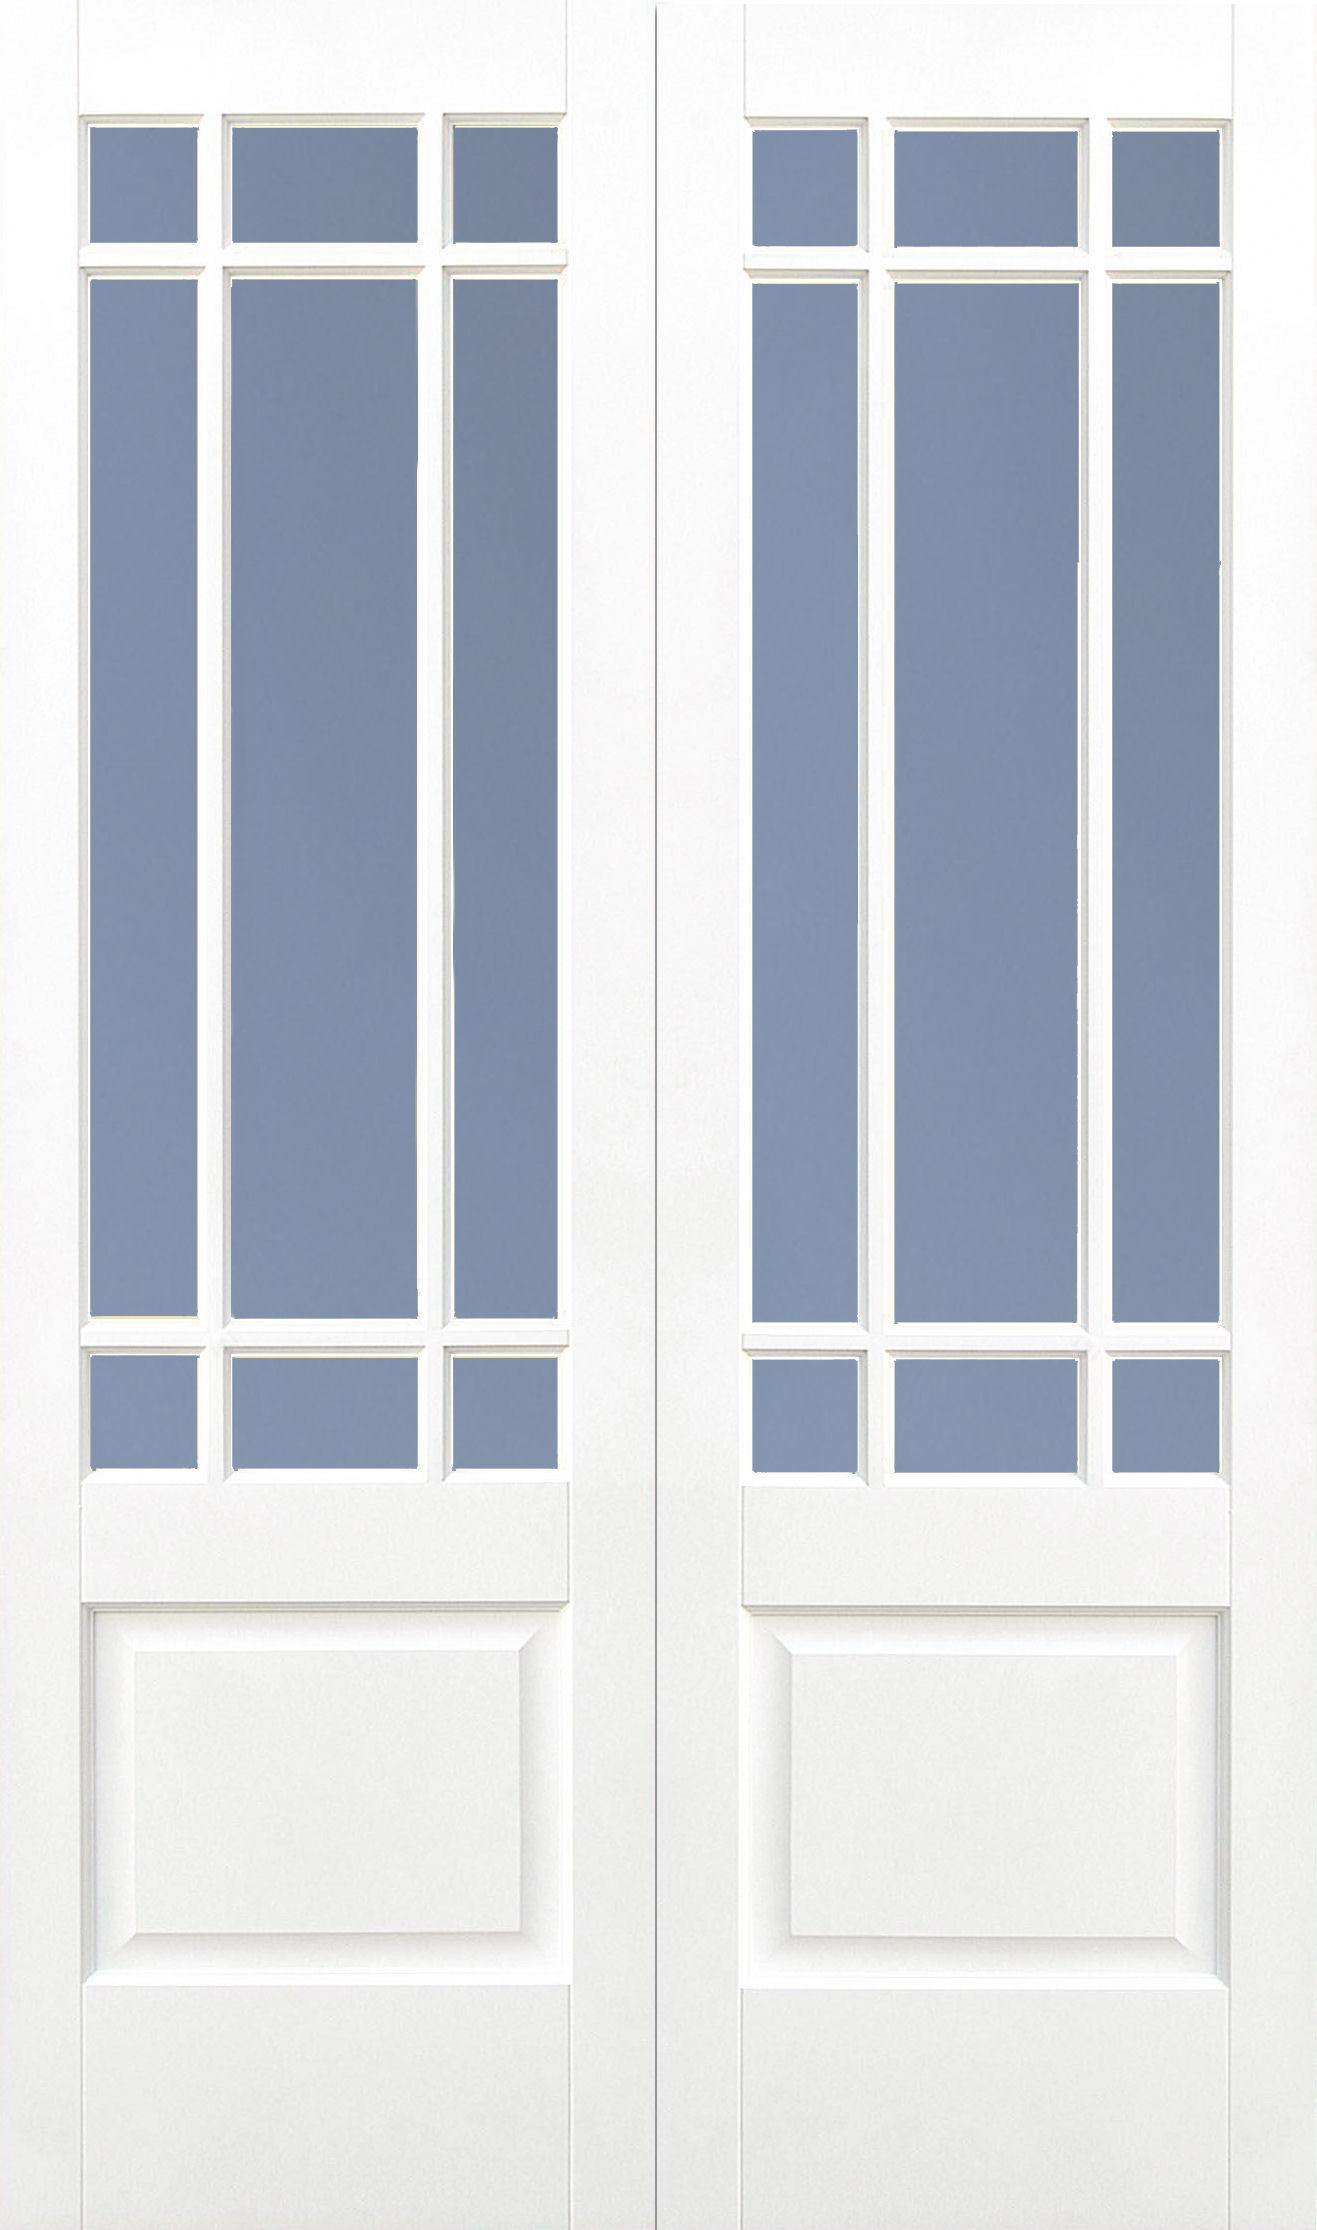 46 x 78 Downham Glazed Double Doors : LPD solid primed downham 9 light glazed double doors from www.topclasscarpentry.com size 1317 x 2230 jpeg 225kB